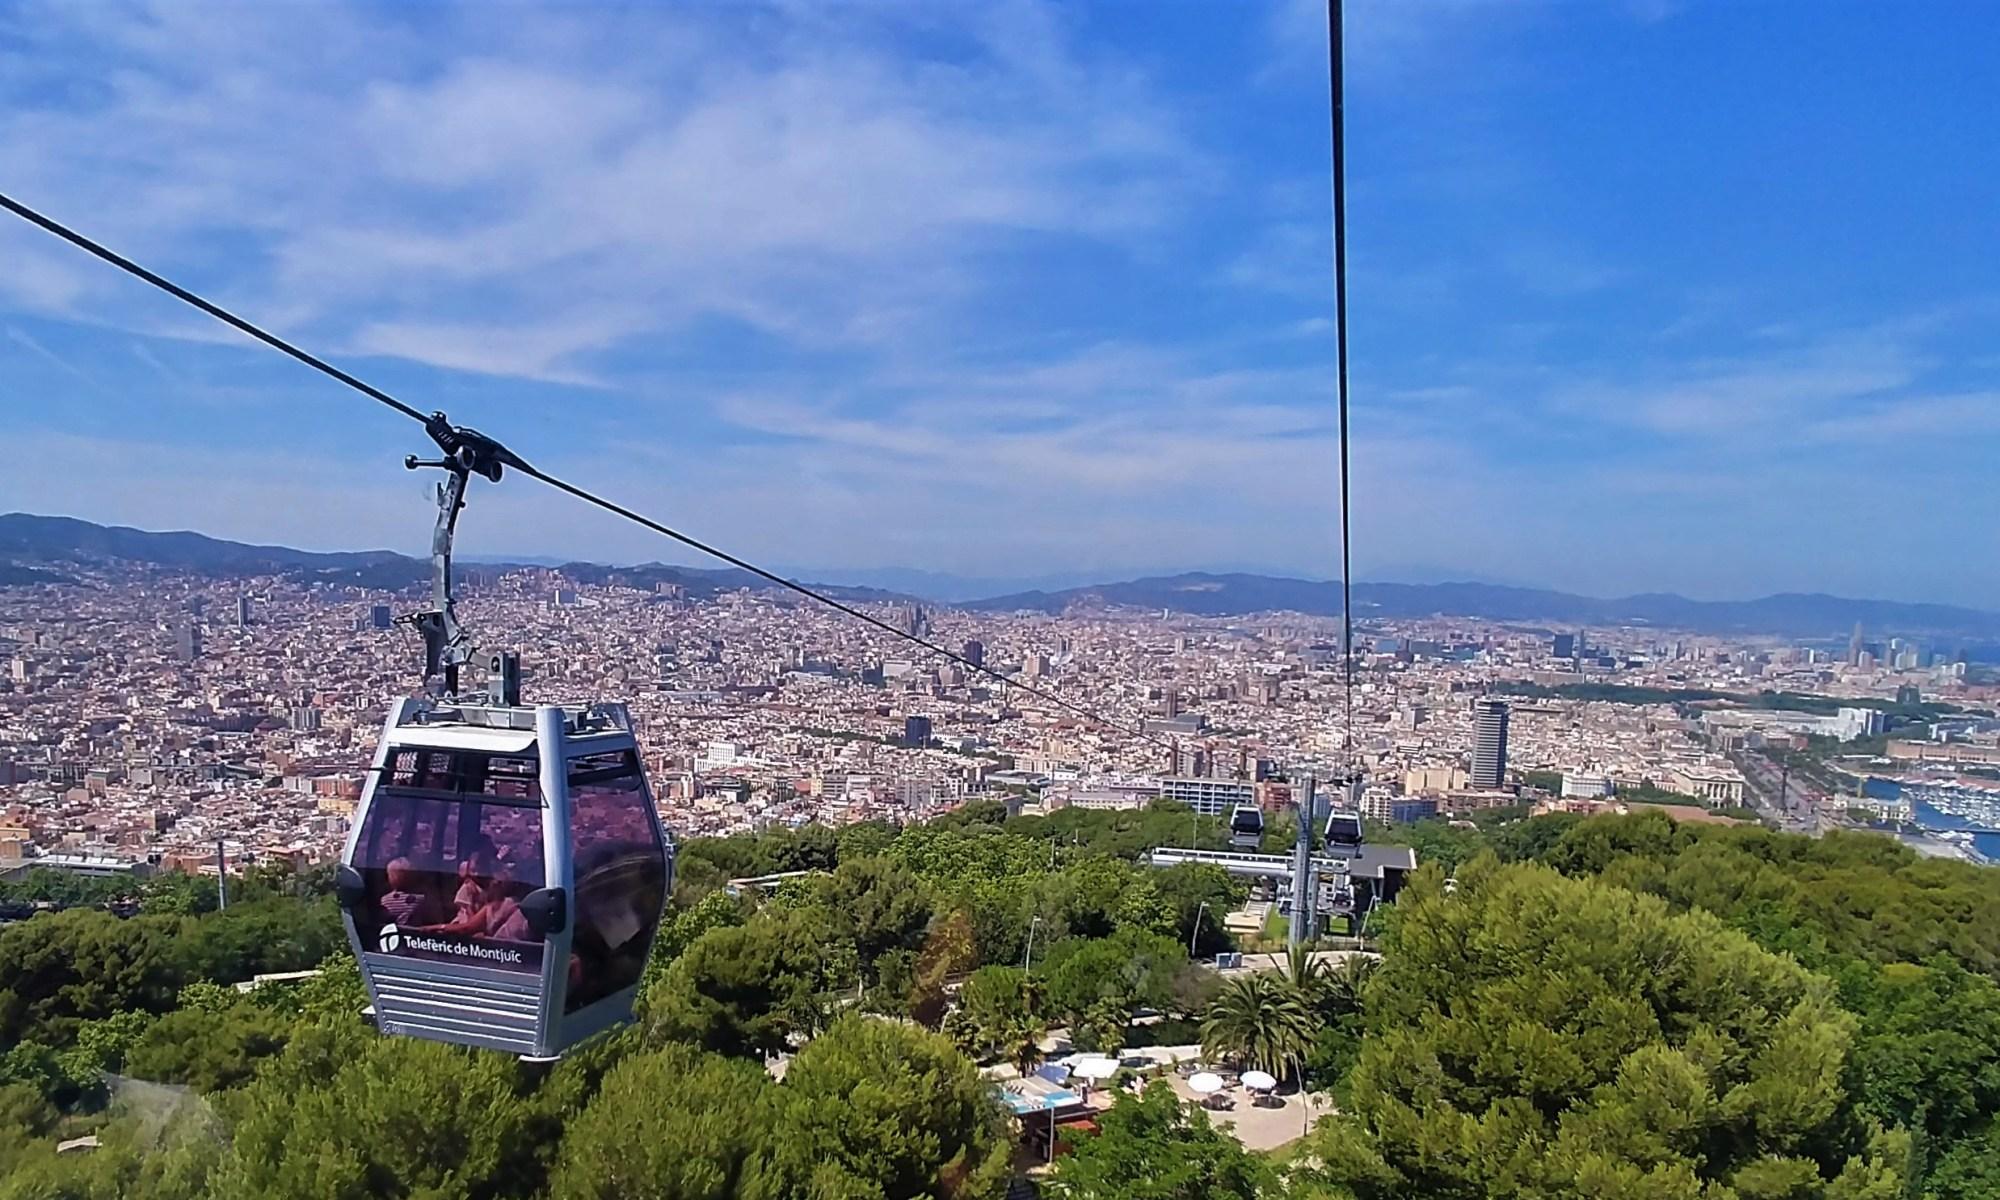 Barcelona, Spain – June 23, 2019: Cable car from Montjuïc to Drassanes at Barcelona Port.